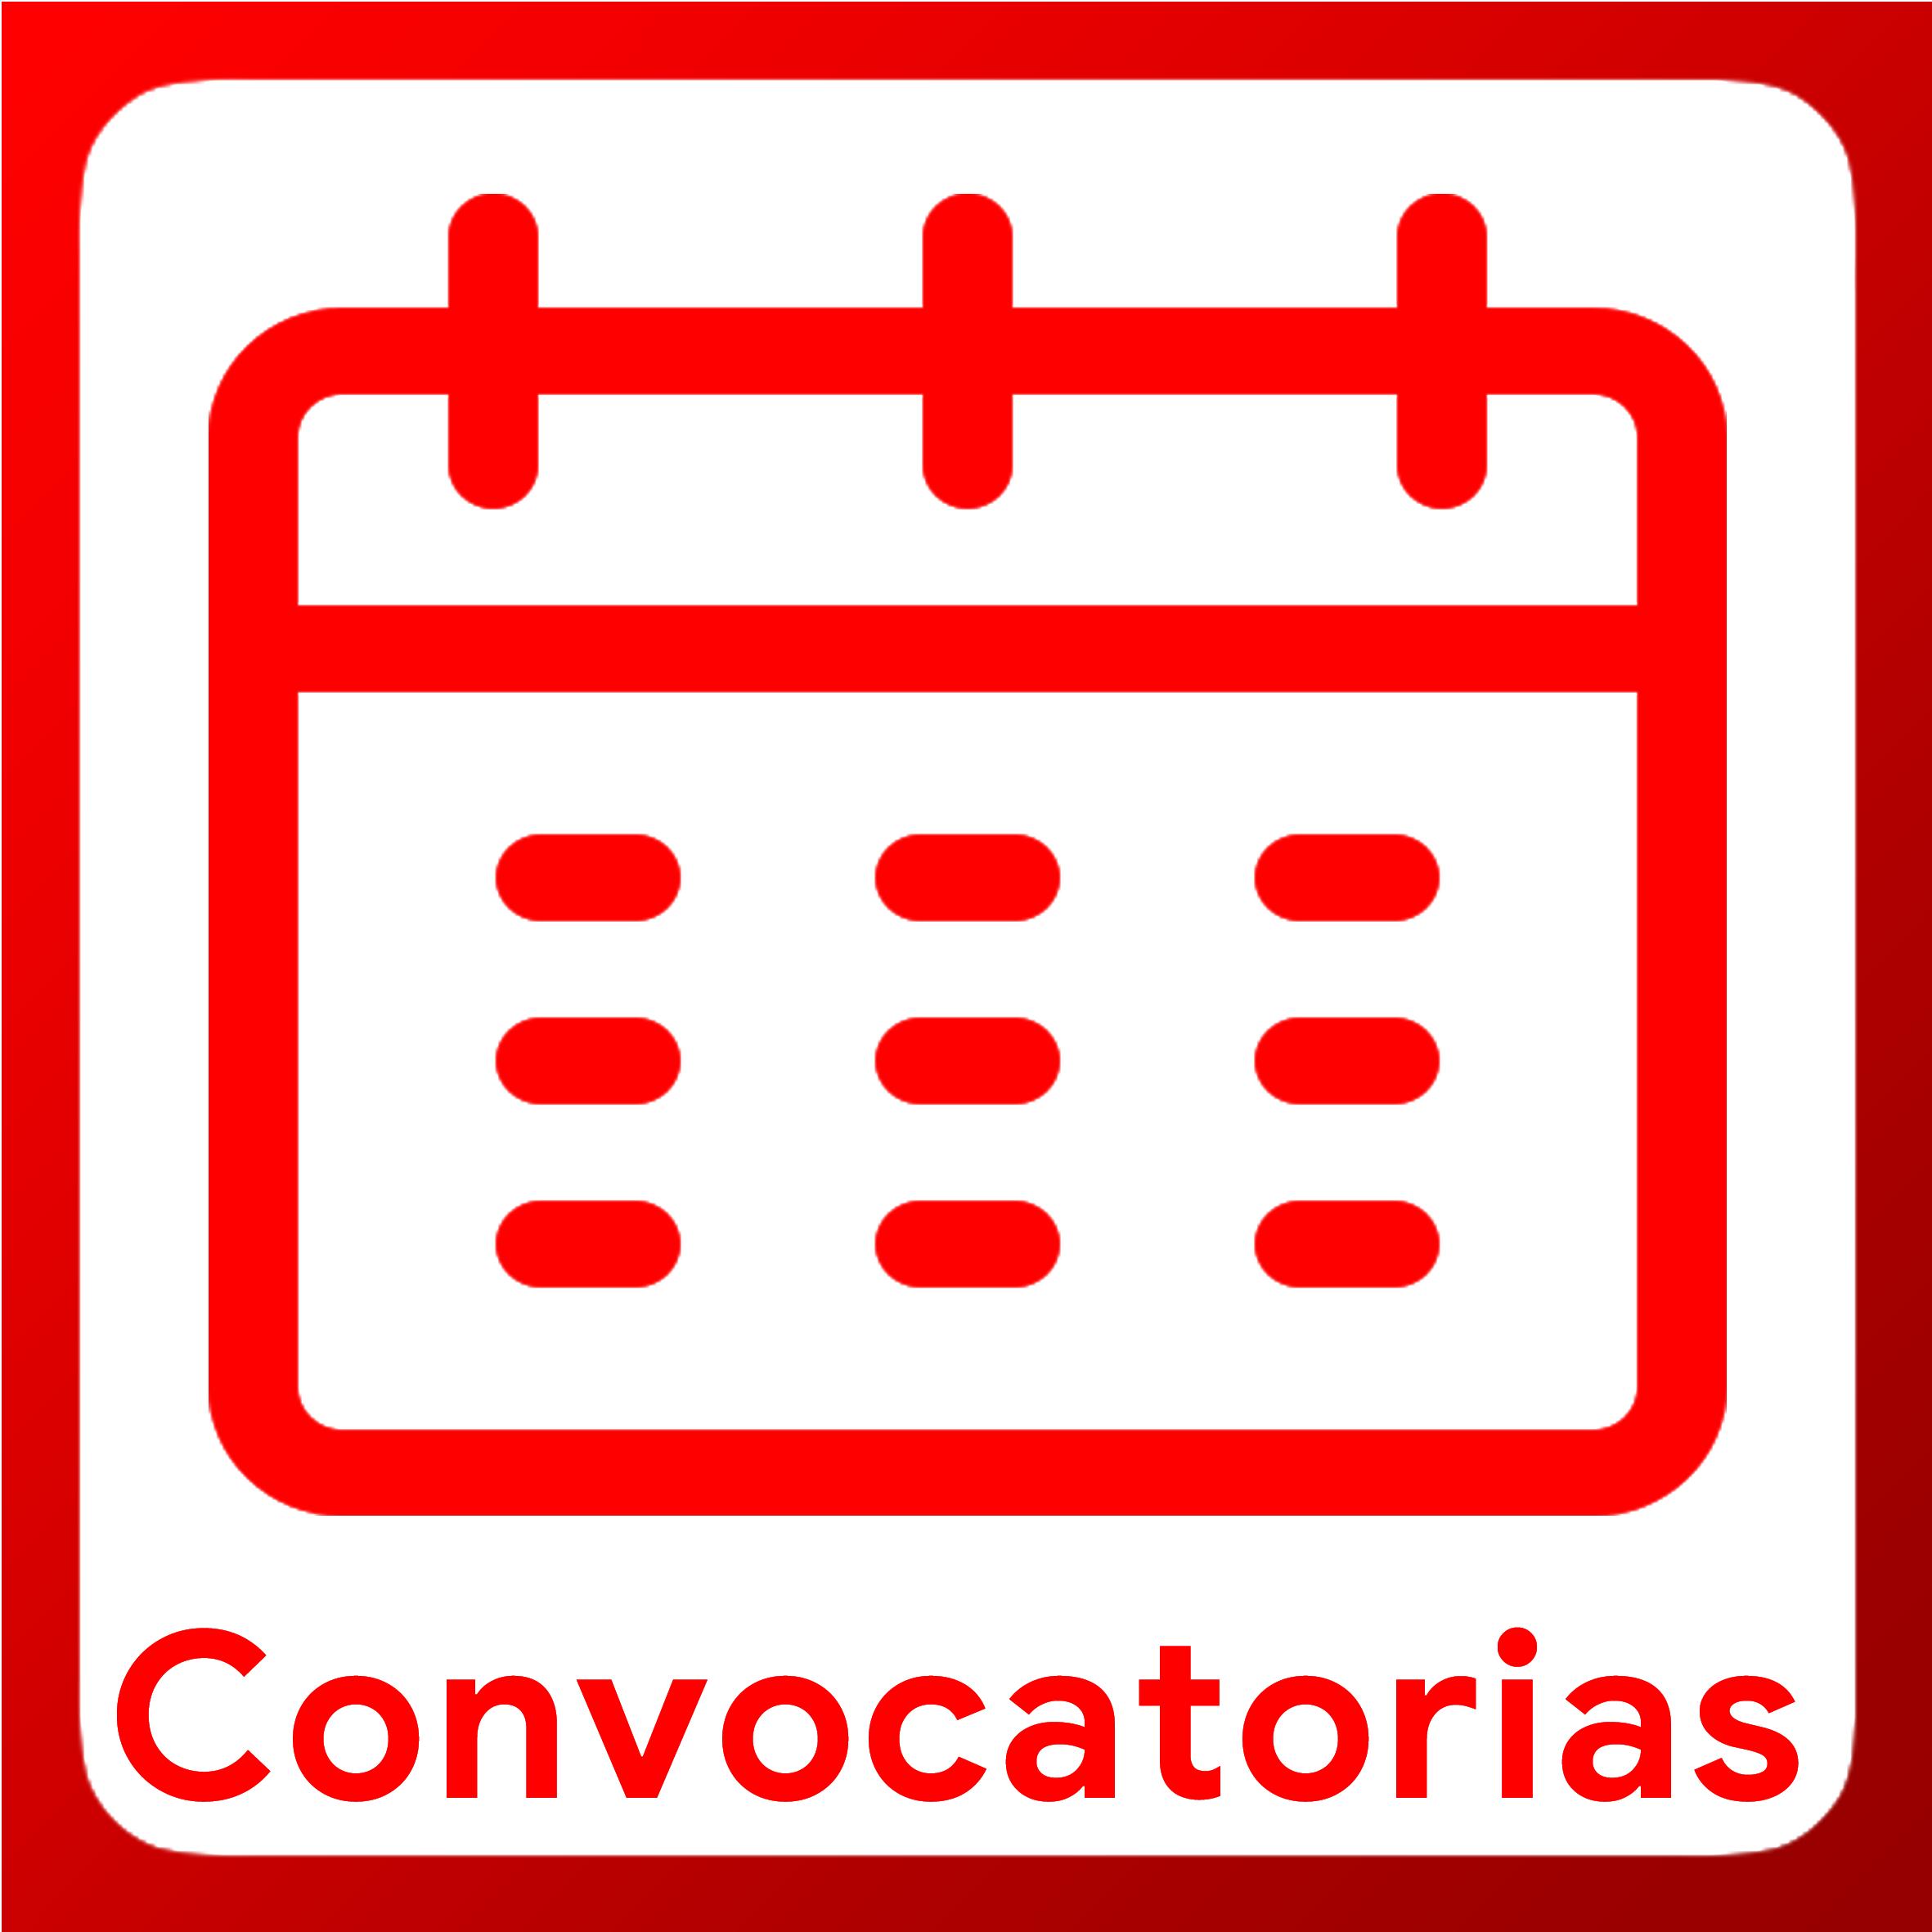 Boton activable de Convocatorias